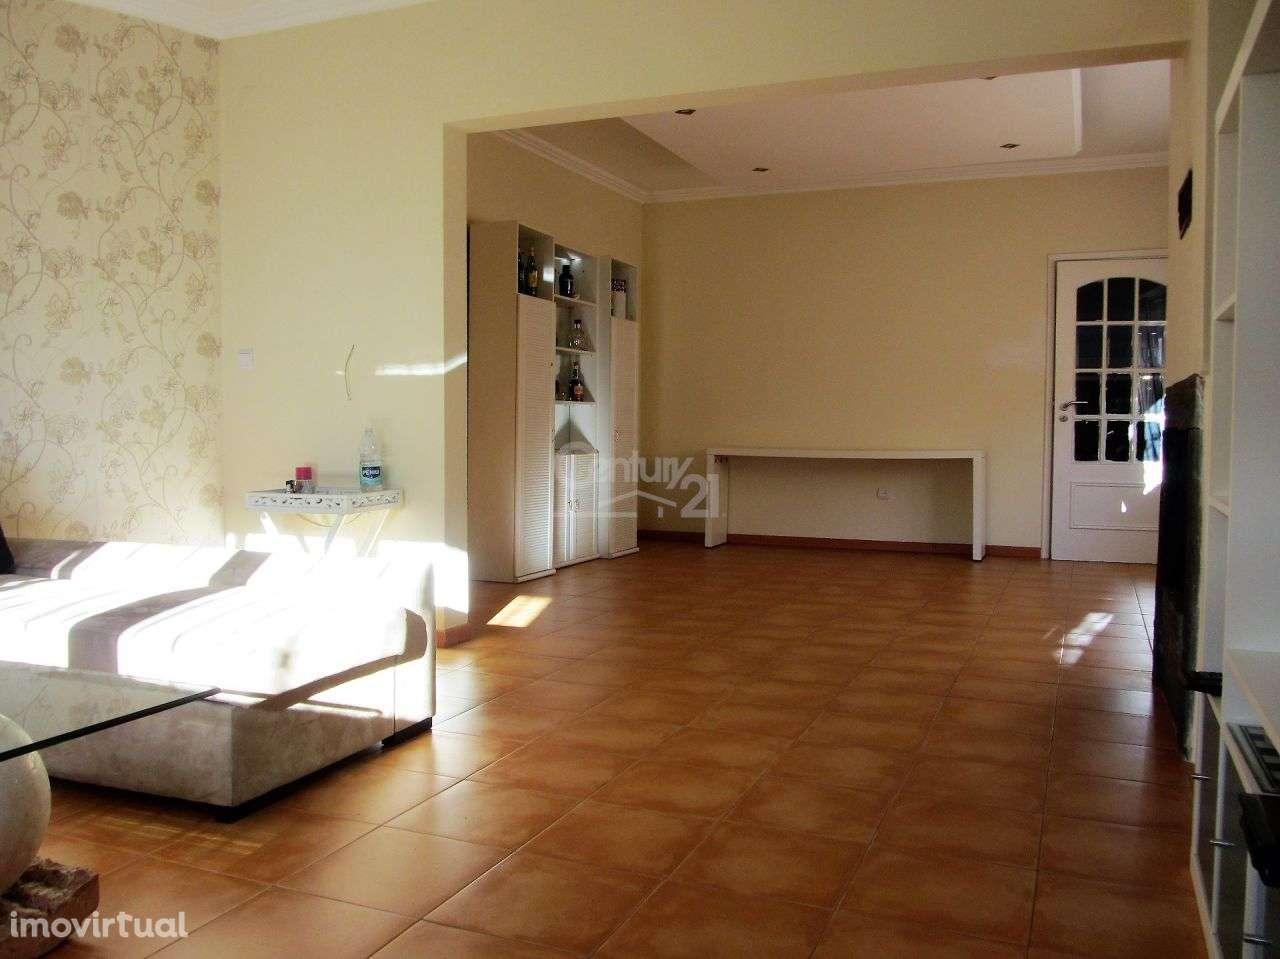 Moradia para comprar, Quinta do Conde, Setúbal - Foto 7